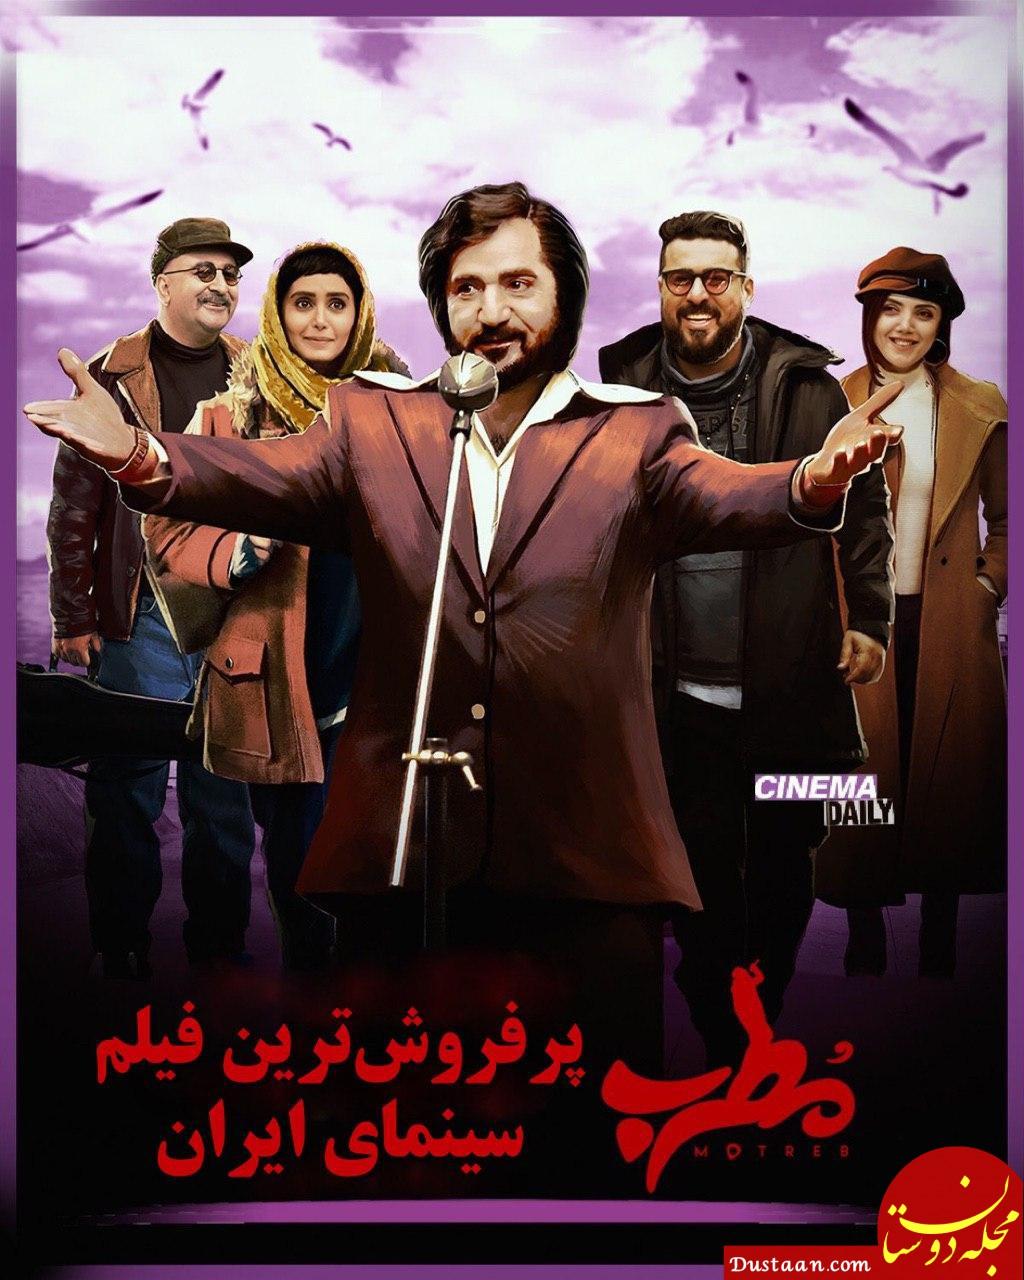 www.dustaan.com - رکورد «هزارپا» شکست: «مطرب» پرفروشترین فیلم سینمای ایران